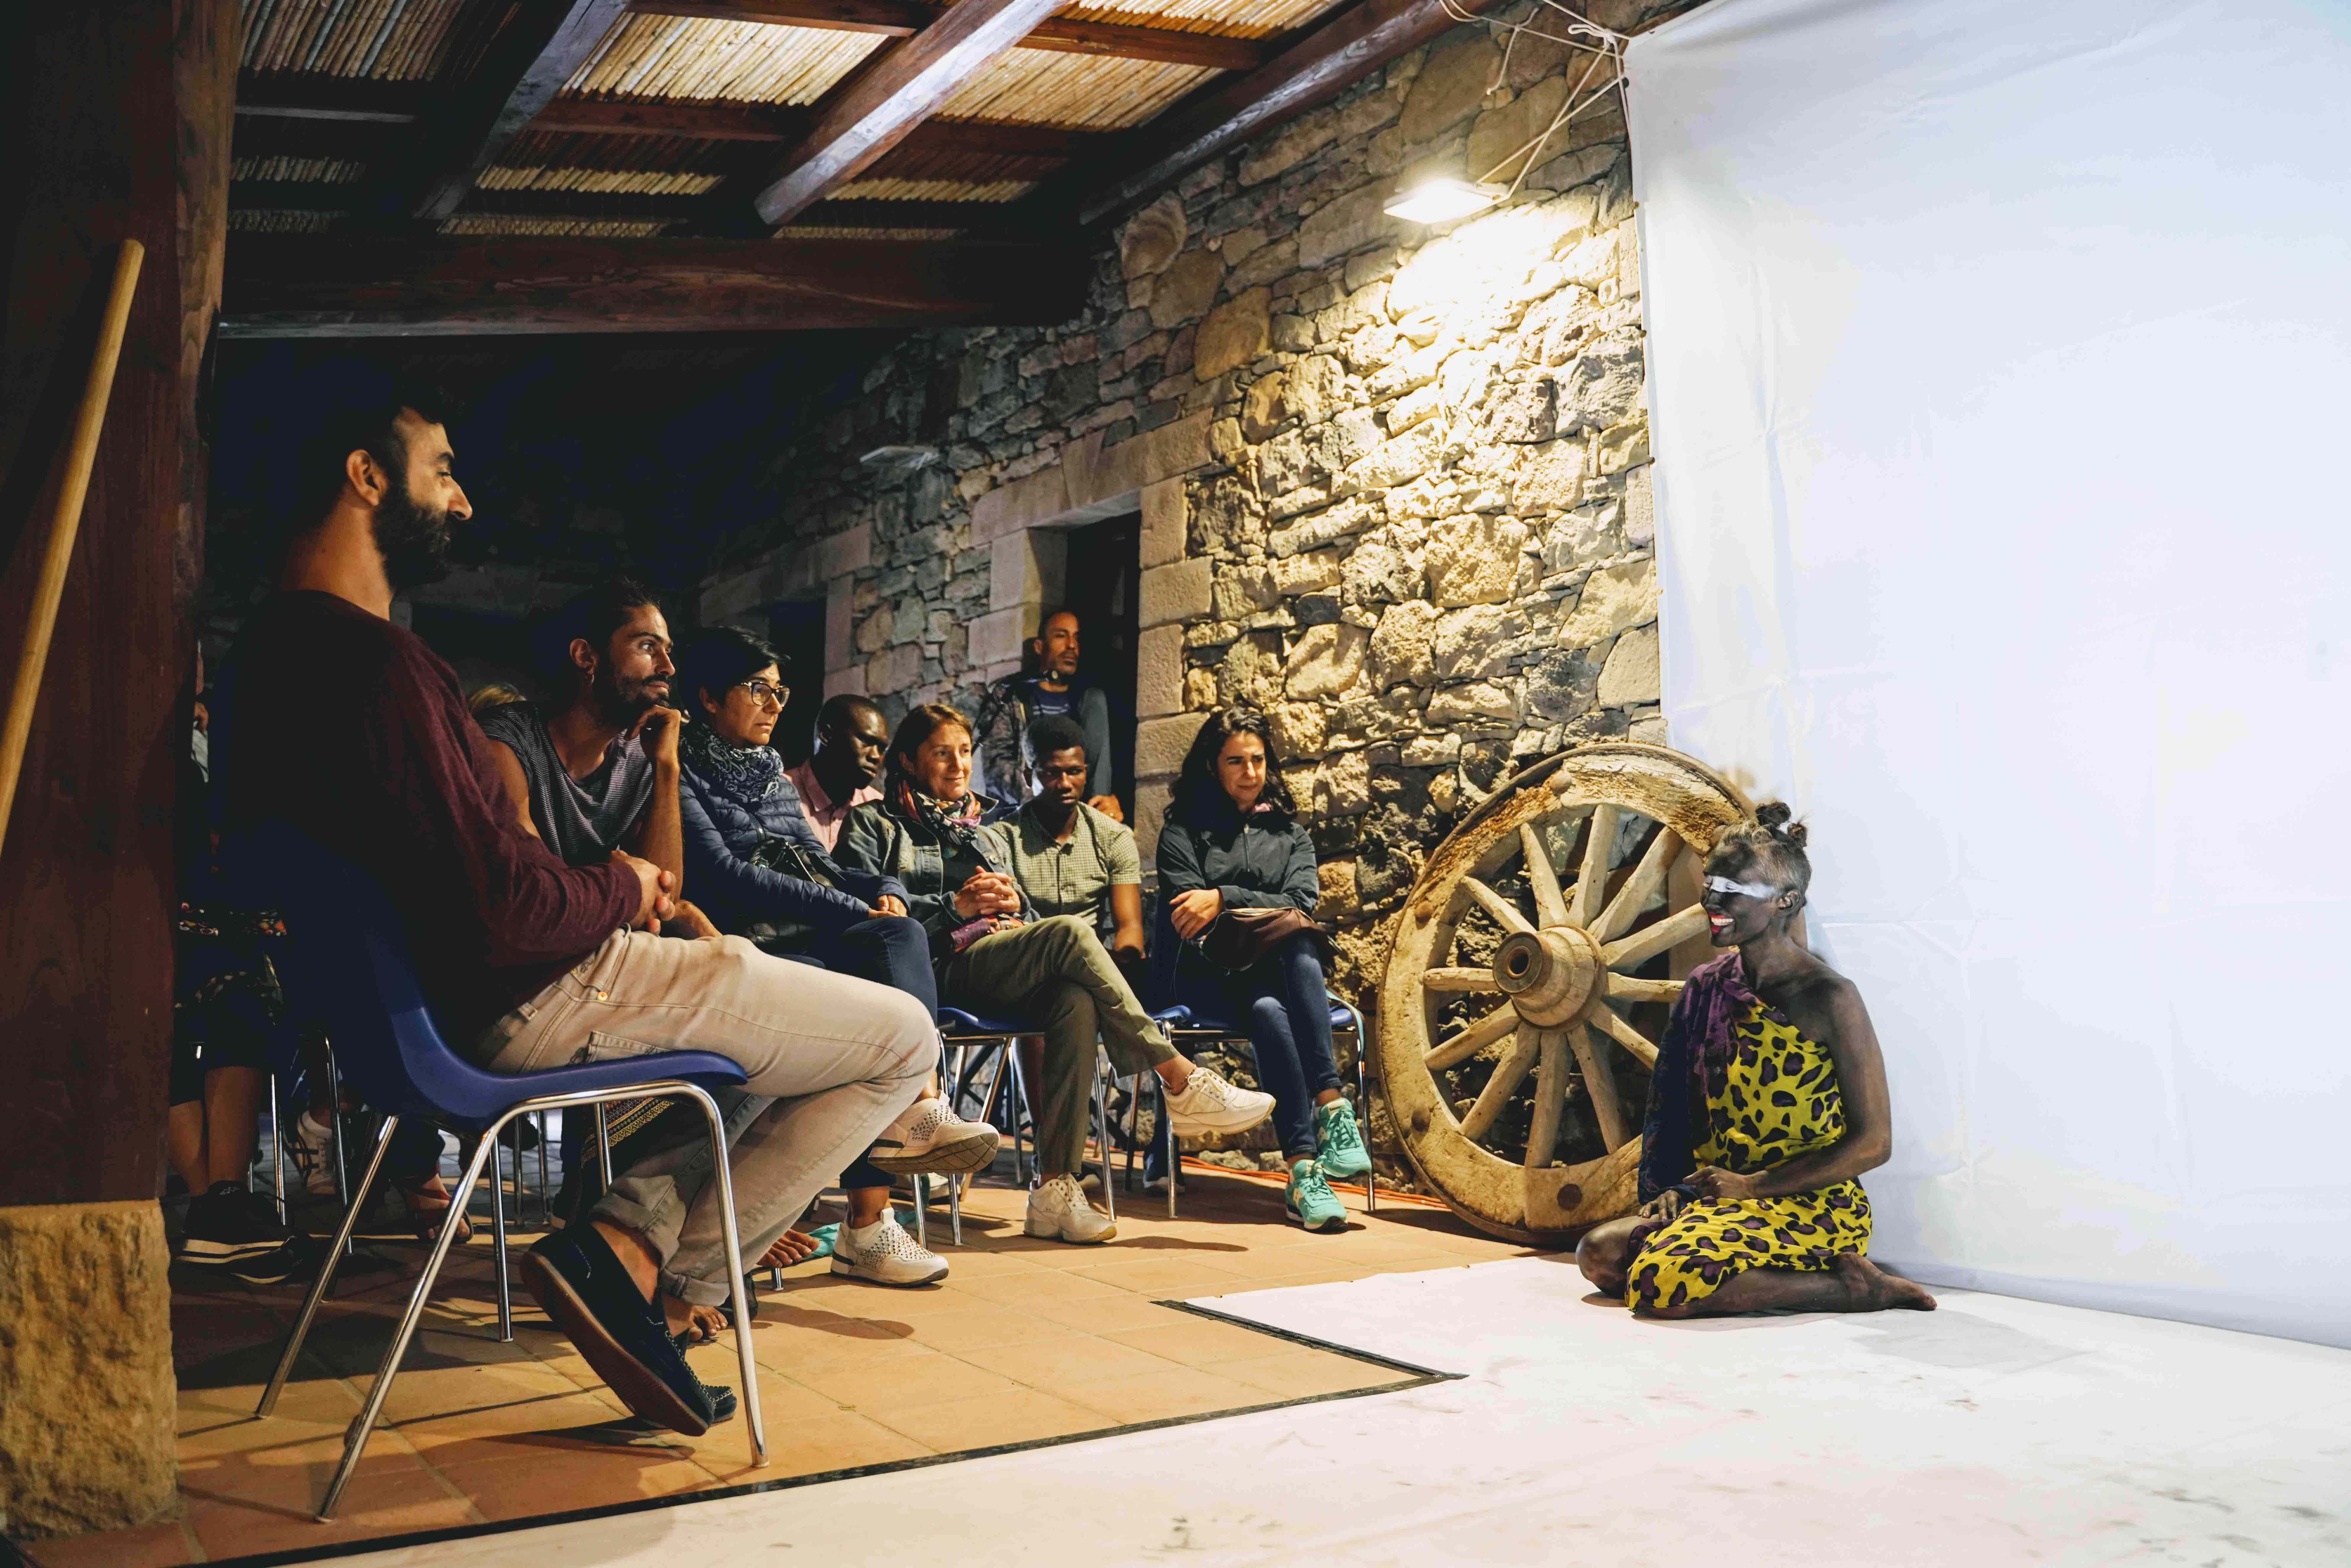 Spectrapolis Residenze artistiche sardegna art music incontro artista performance residence artistique